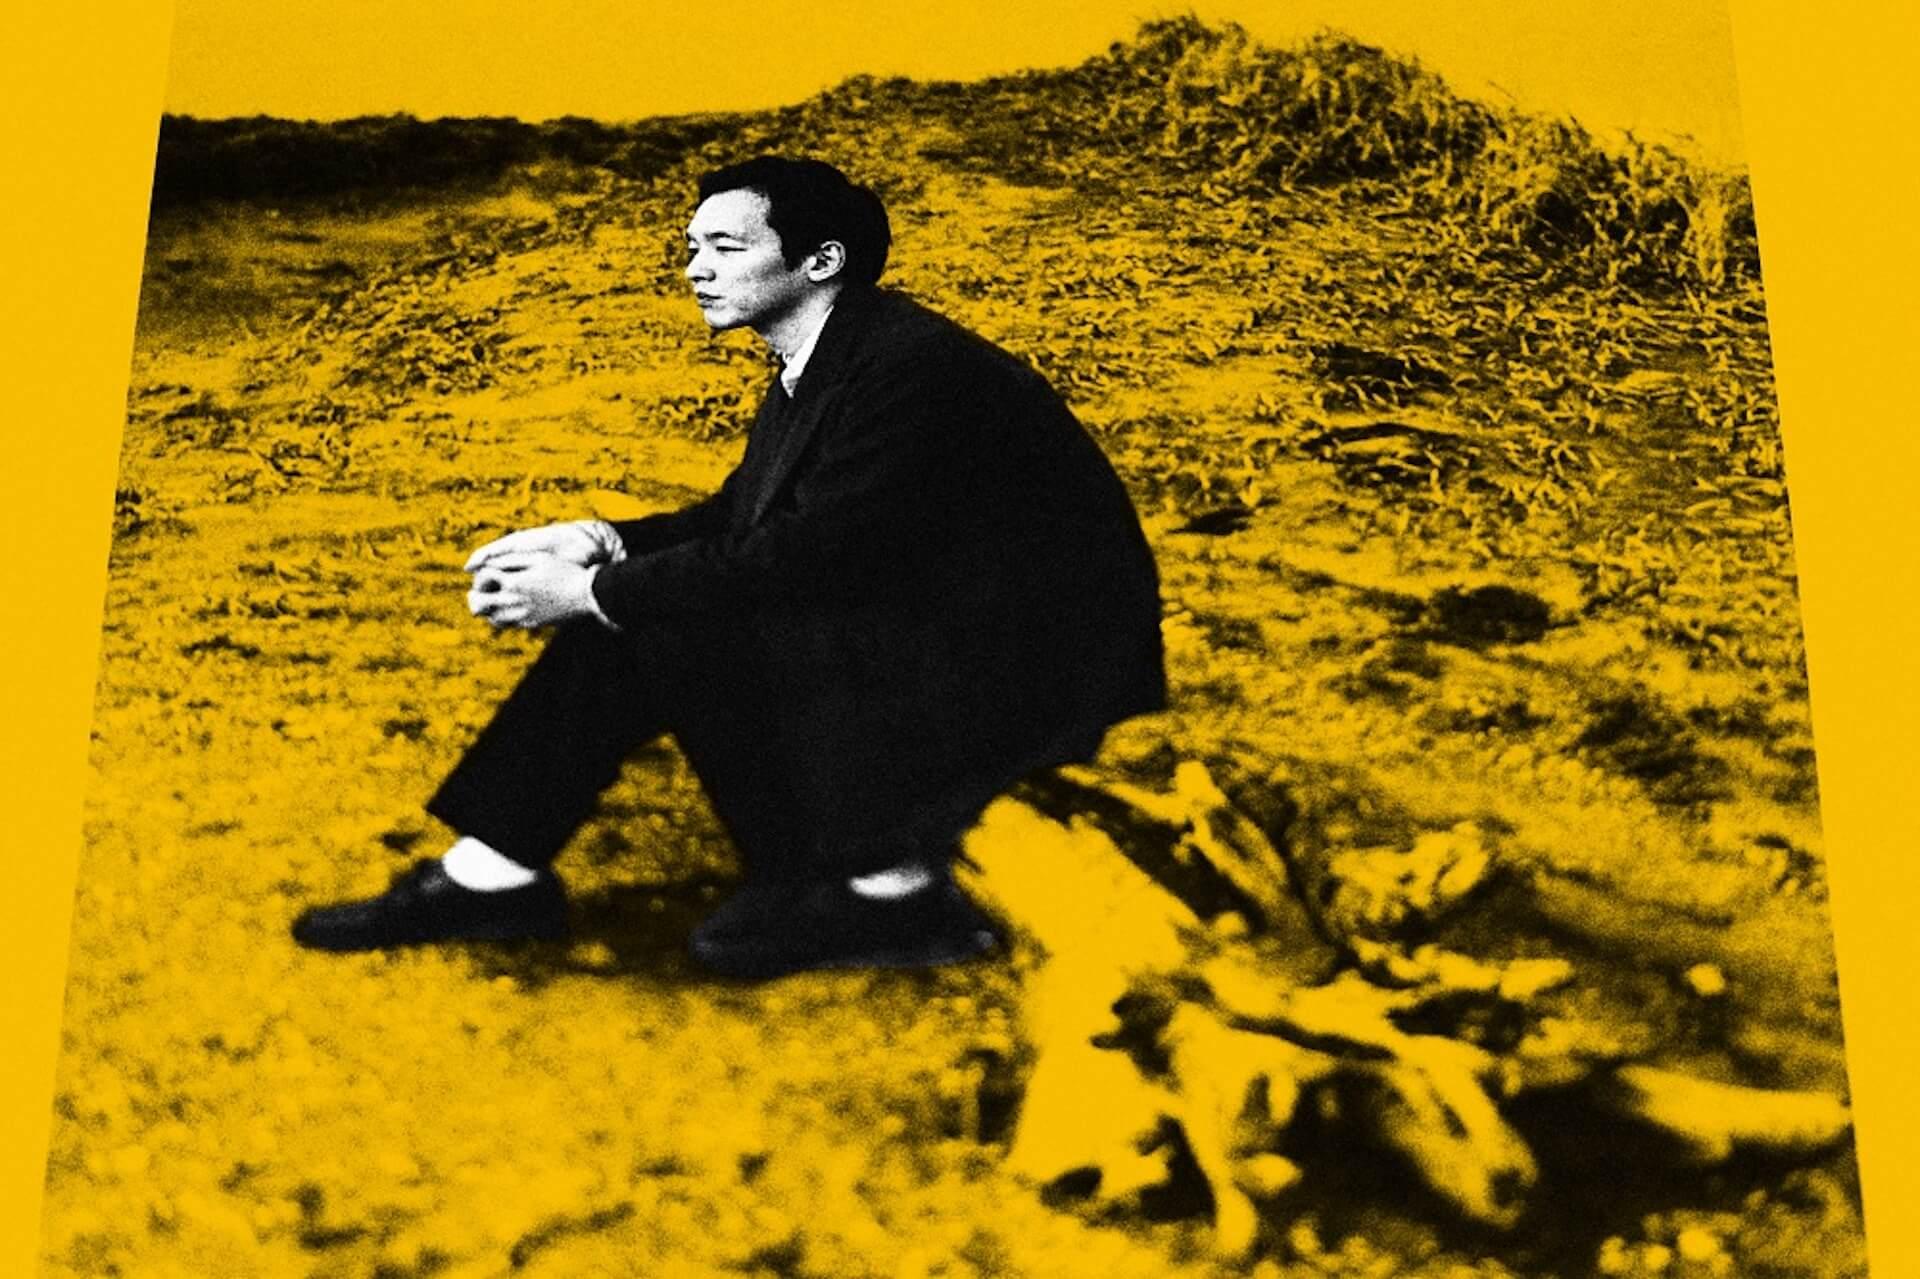 cero髙城晶平ソロプロジェクトShohei Takagi Parallela Botanicaが1stアルバムから「ミッドナイト・ランデヴー」を先行配信 music200319_cero_takagi_1